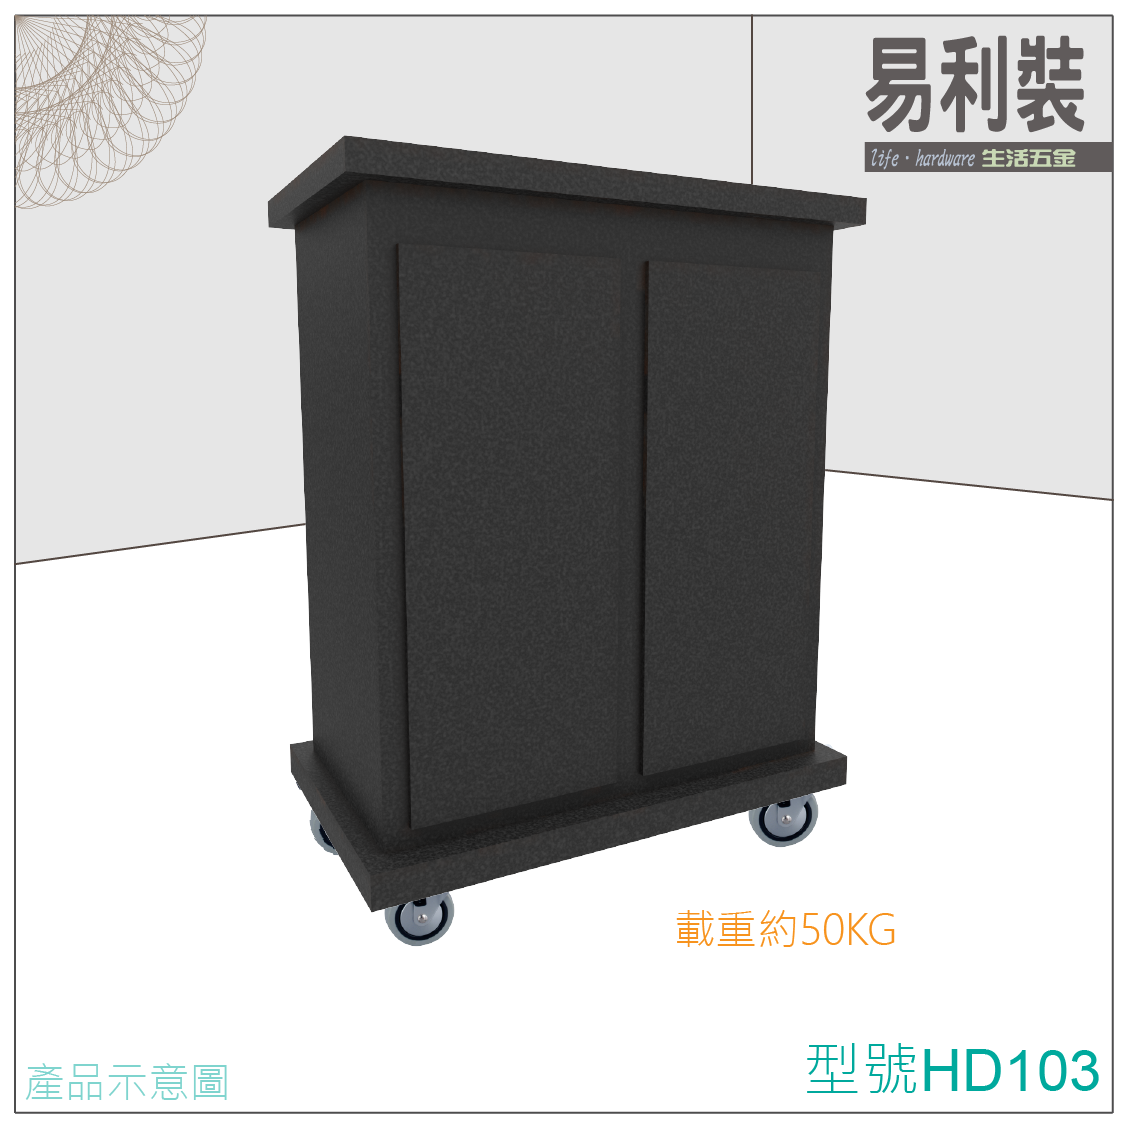 【 EASYCAN  】HD103-活動輪 易利裝生活五金 桌輪 櫃輪 房間 臥房 衣櫃 小資族 辦公家具 系統家具 2